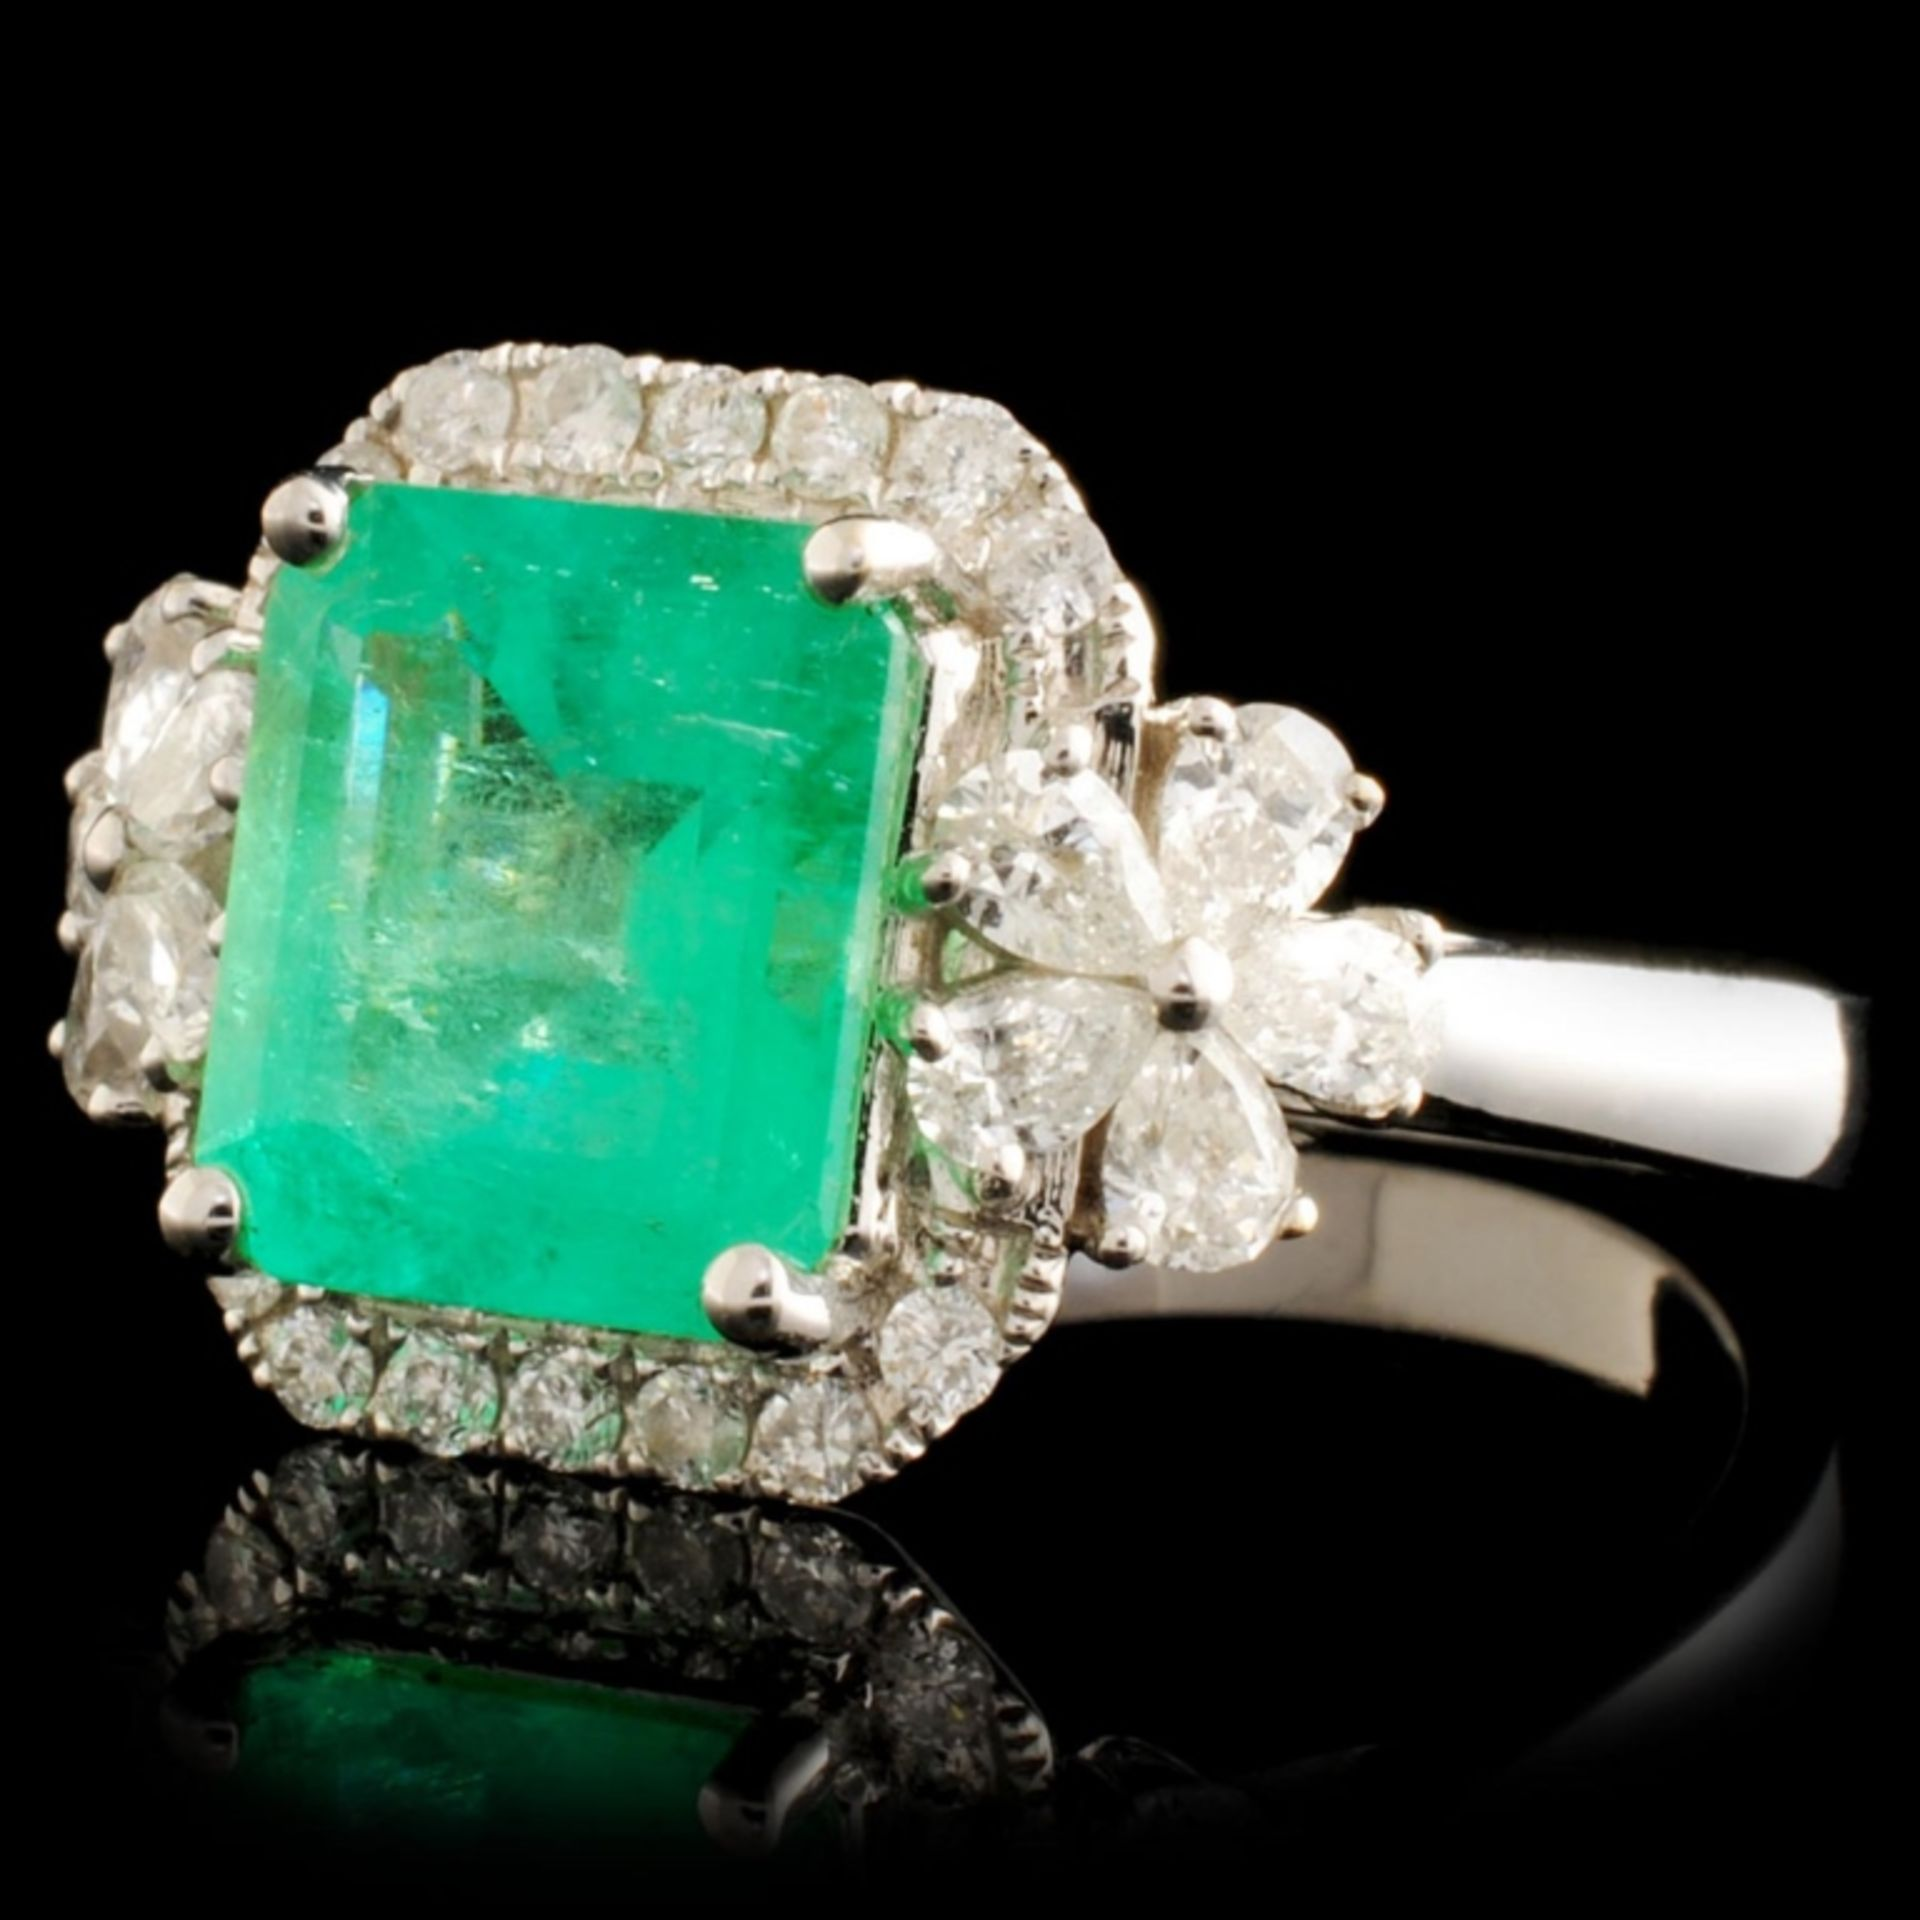 18K Gold 2.60ct Emerald & 0.77ctw Diamond Ring - Image 2 of 5